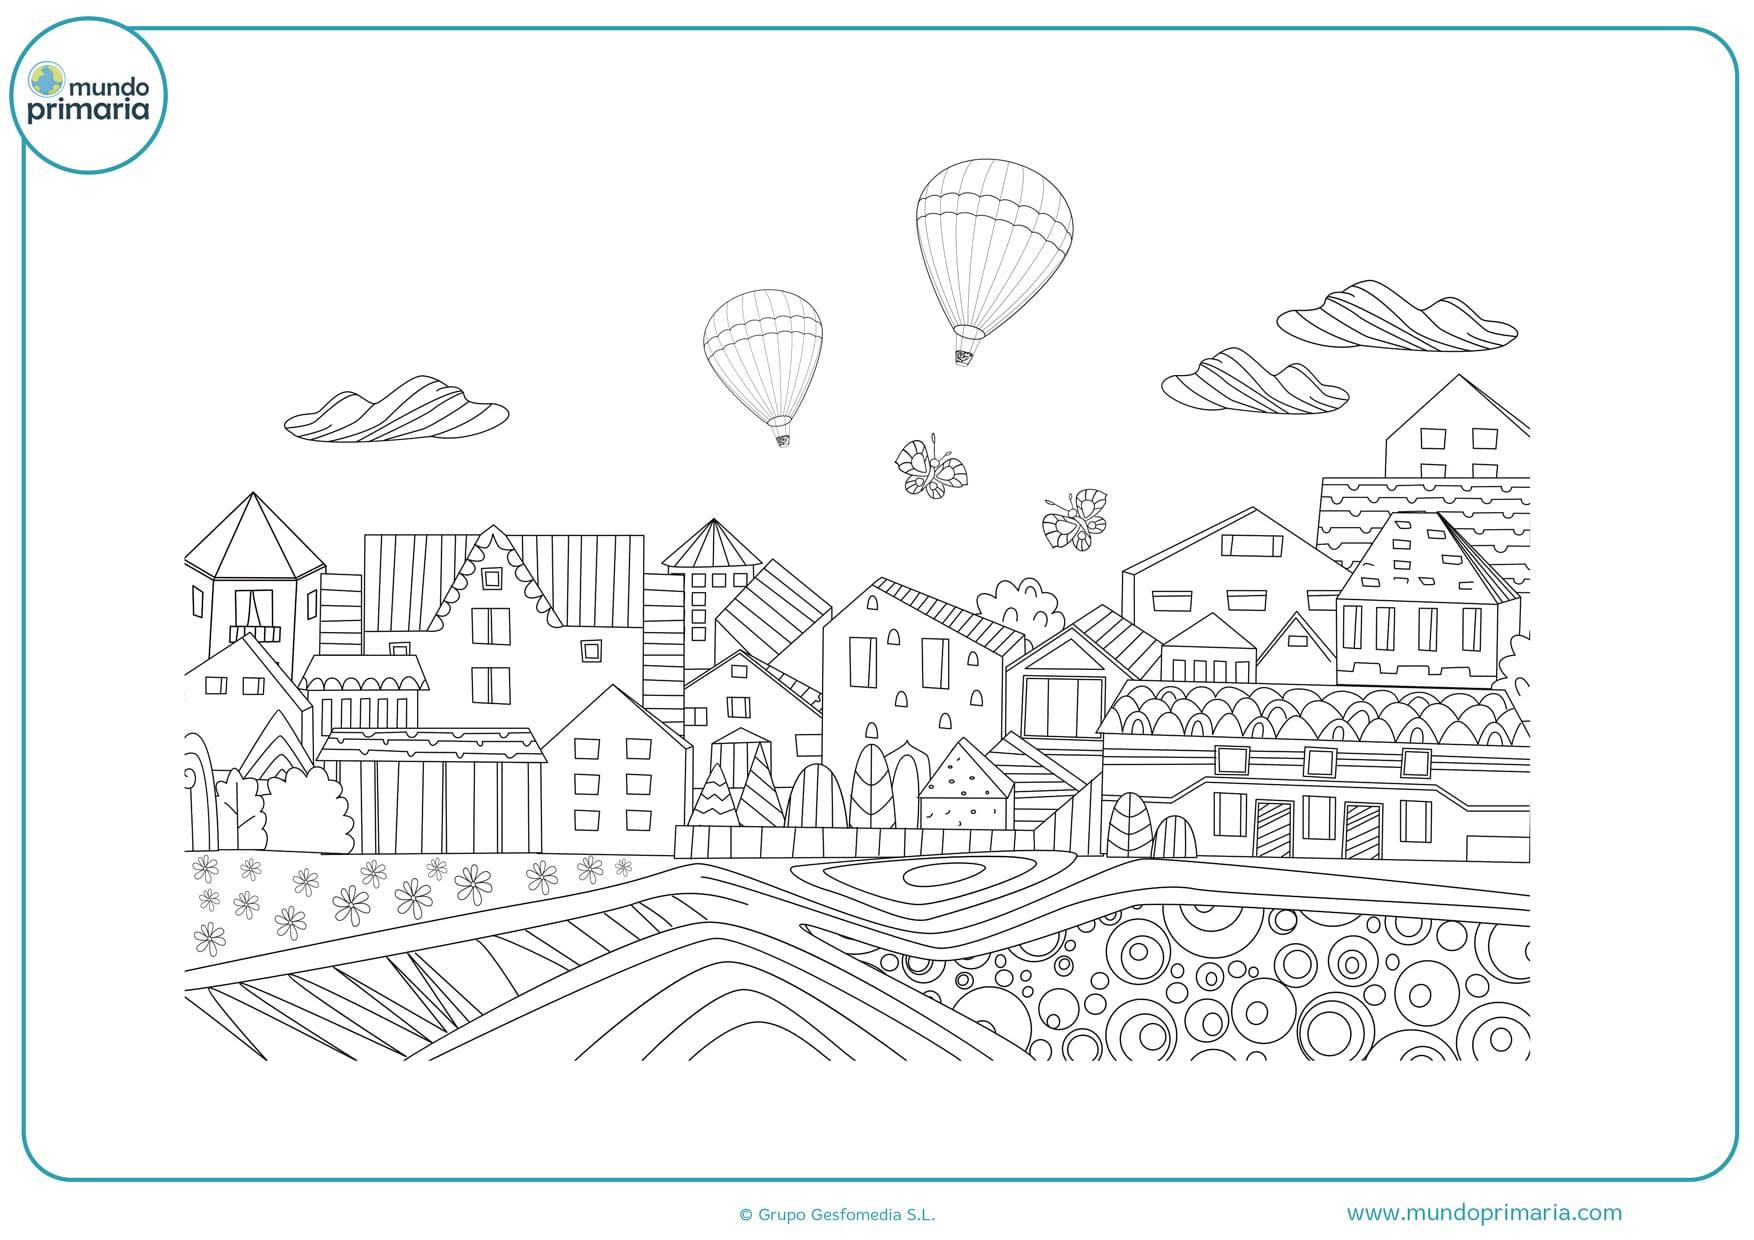 dibujos de interiores de casas para colorear